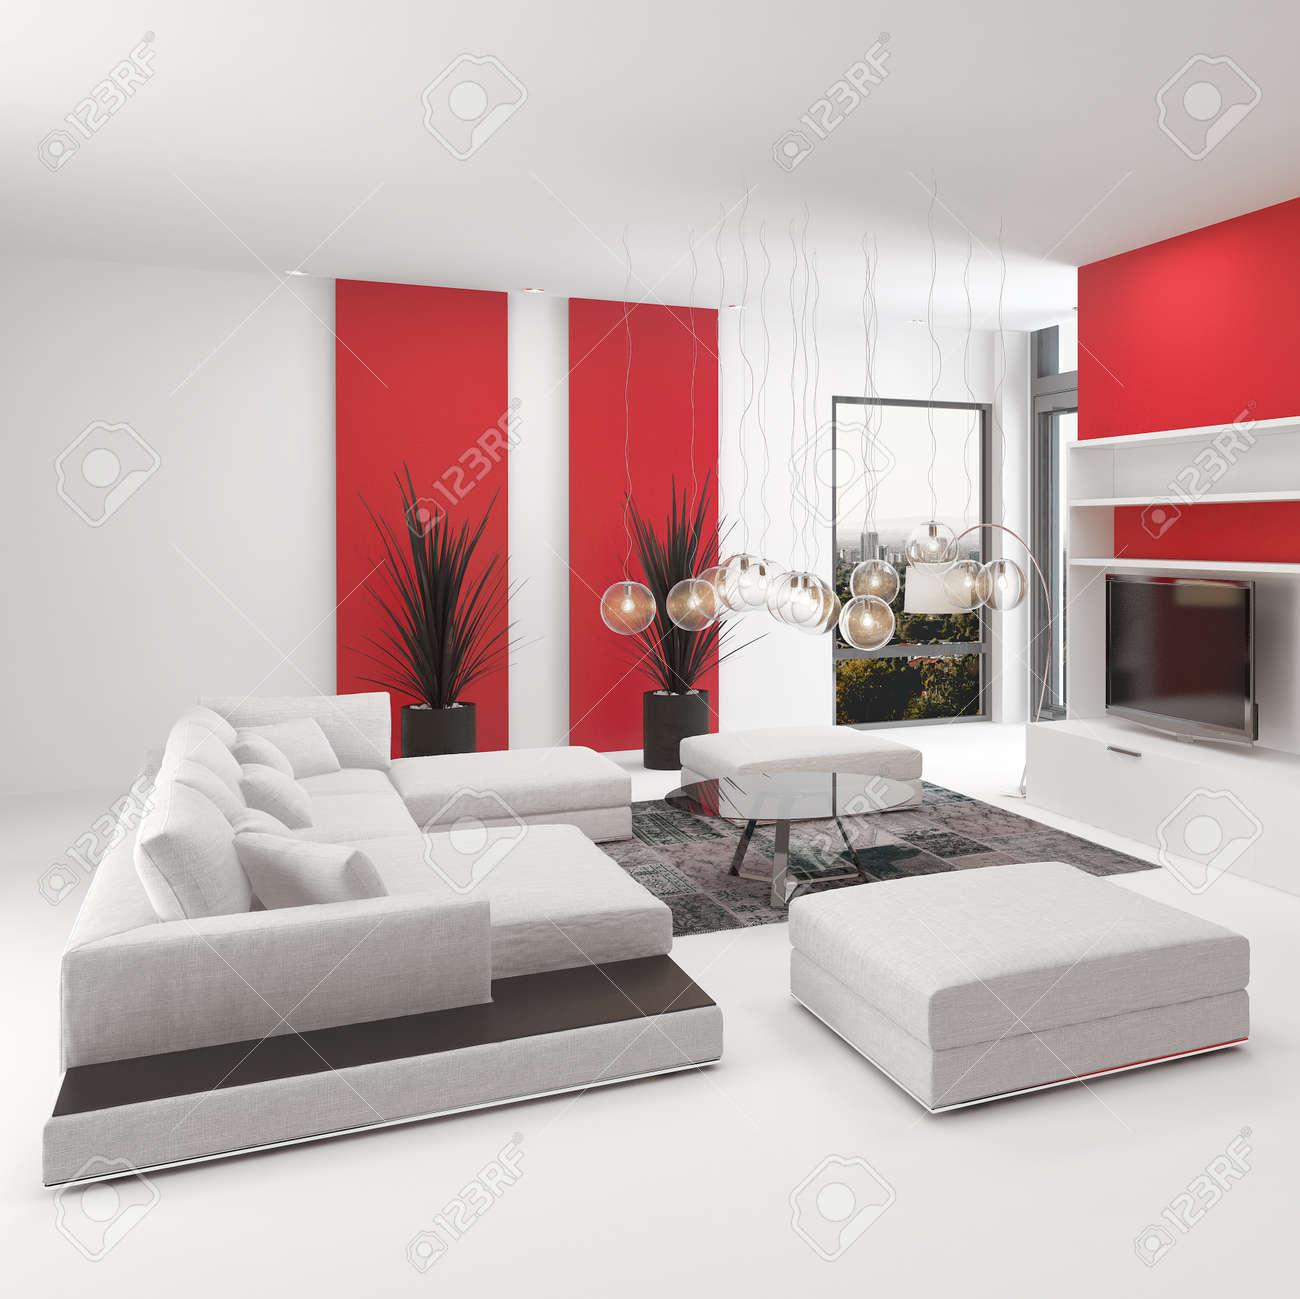 Chique moderne woonkamer interieur met levendige rode accenten en ...